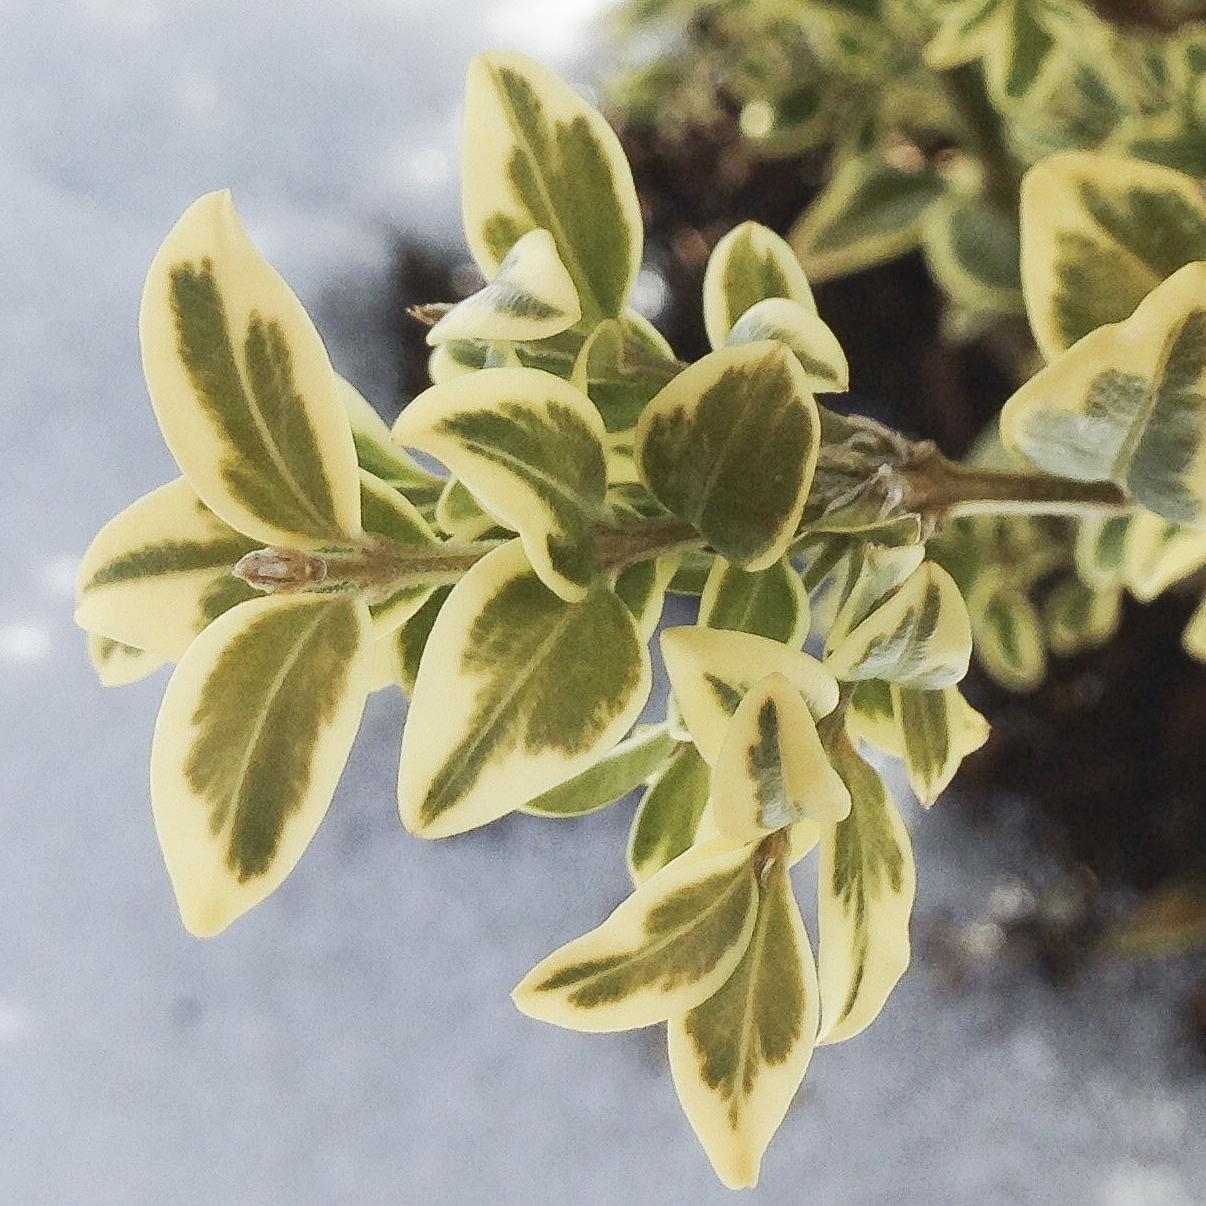 English Boxwood - The variegated foliage of English boxwood, Buxus sempervirens 'Variegata.'